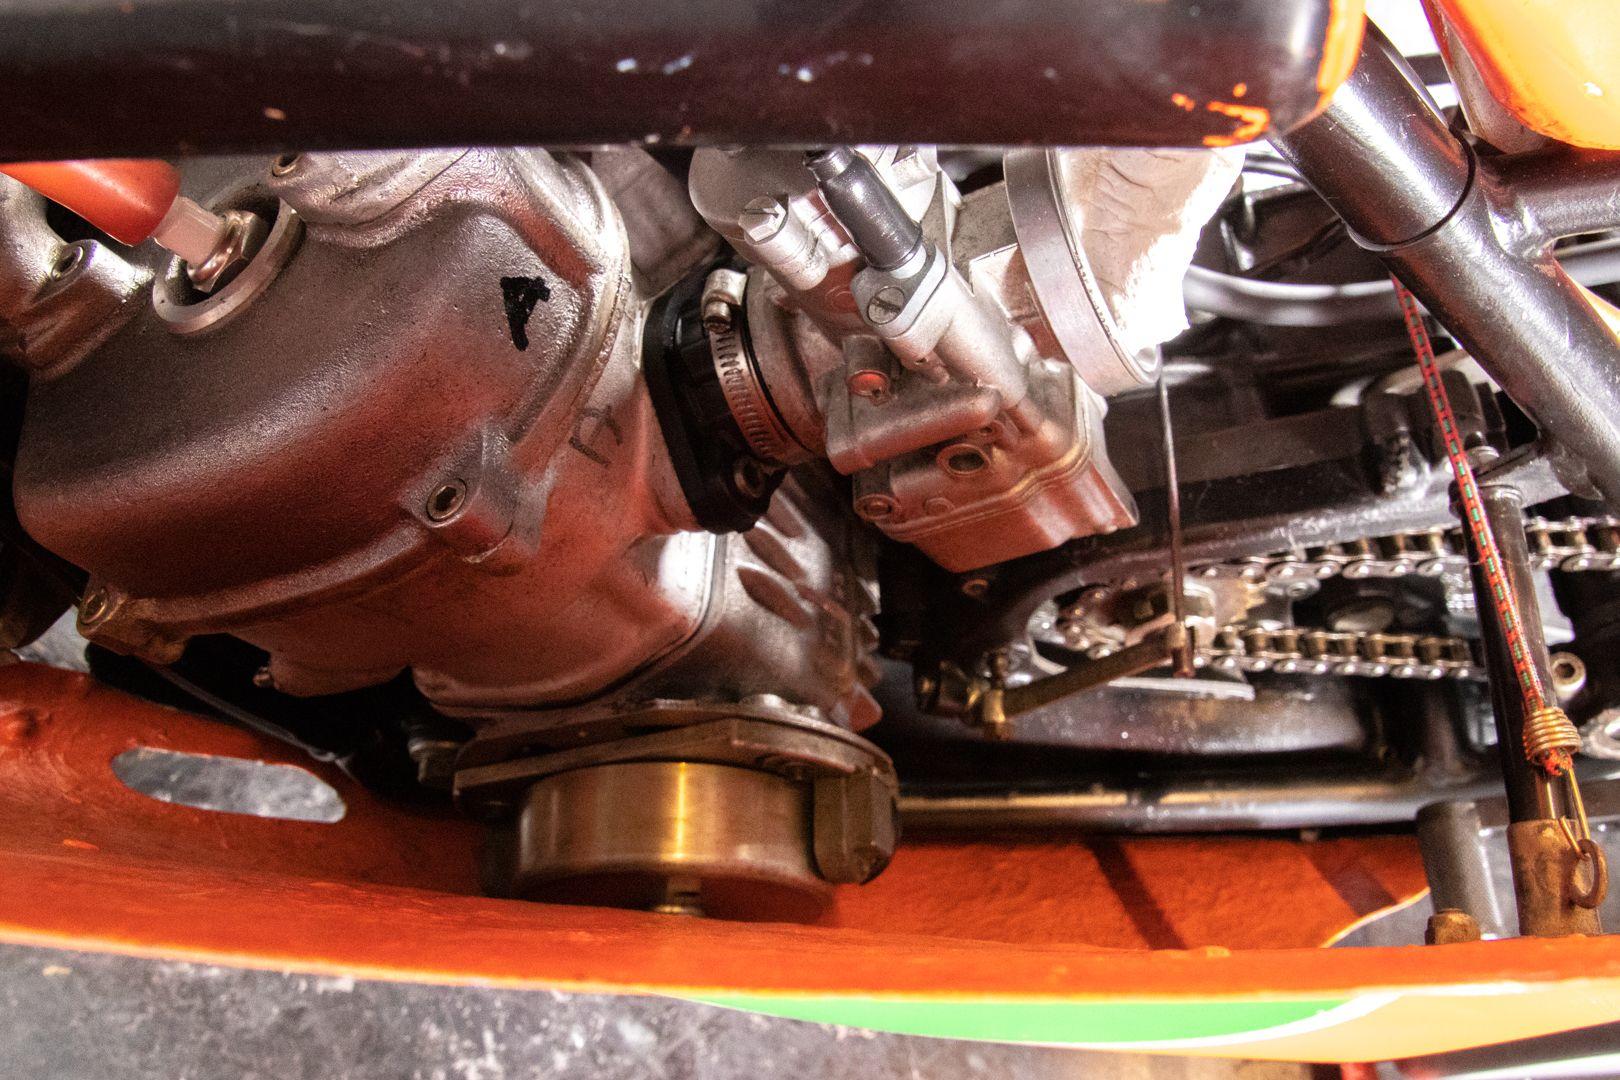 1974 HARLEY DAVIDSON 250 RR 51568